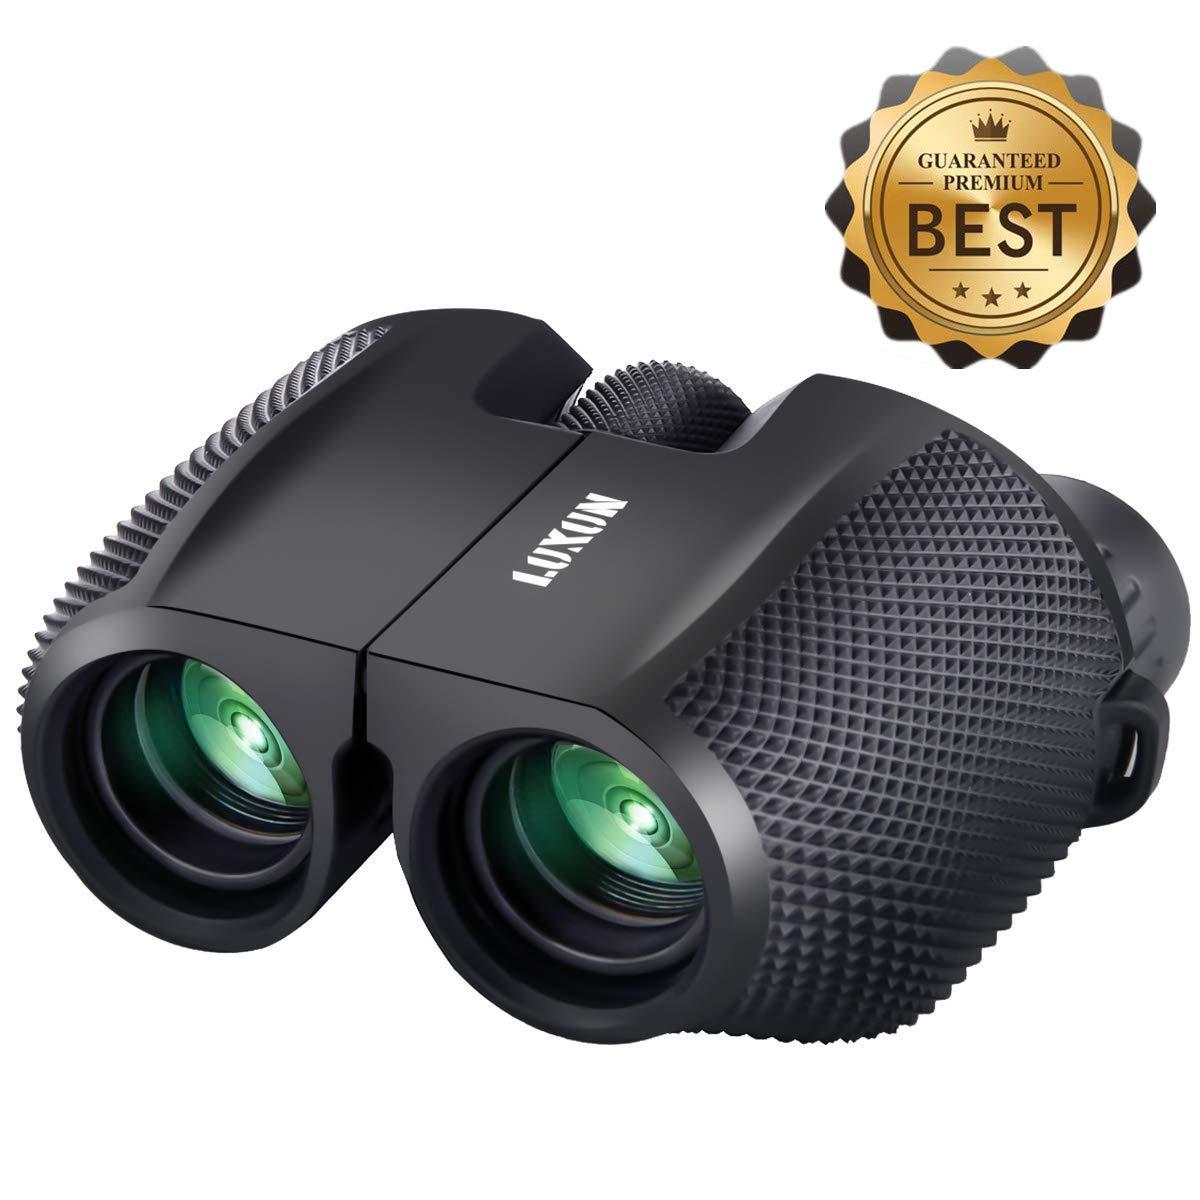 SGODDE Compact Binoculars for Adult Kids 10x25 Waterproof Binocular Weak Light Night Vision Folding High Powered Clear Binoculars Lightweight Bird Watching by SGODDE